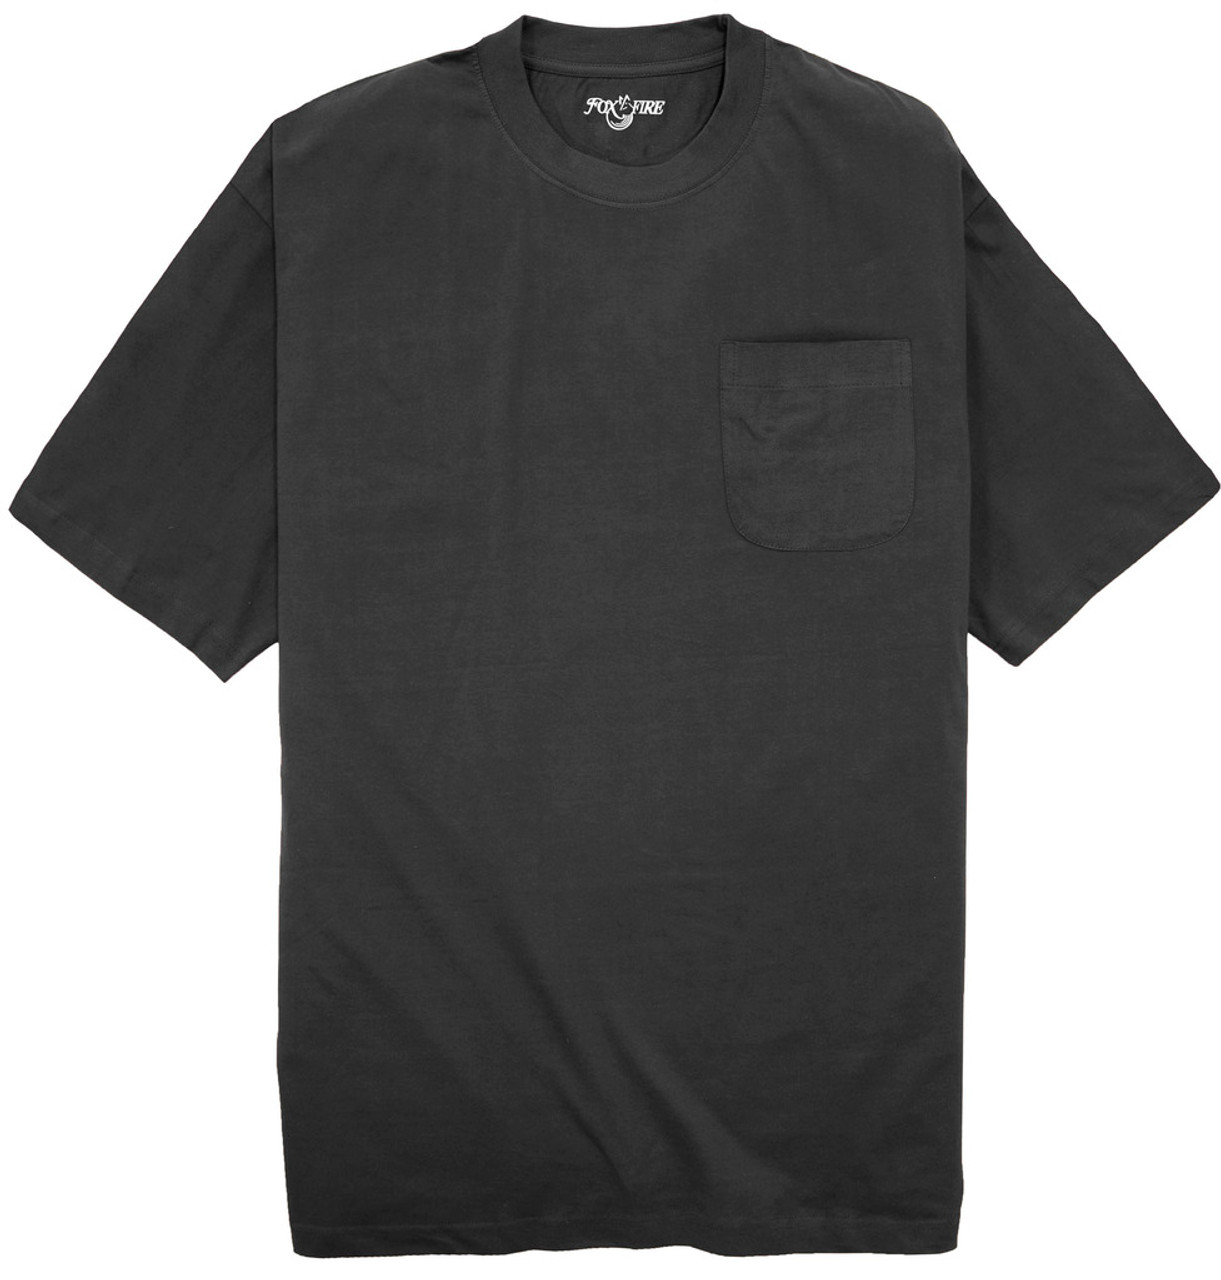 2 SHIRTS 100/% Cotton Hanes Mens Shirts Tagless  Big /& TALL T-Shirts 4XL